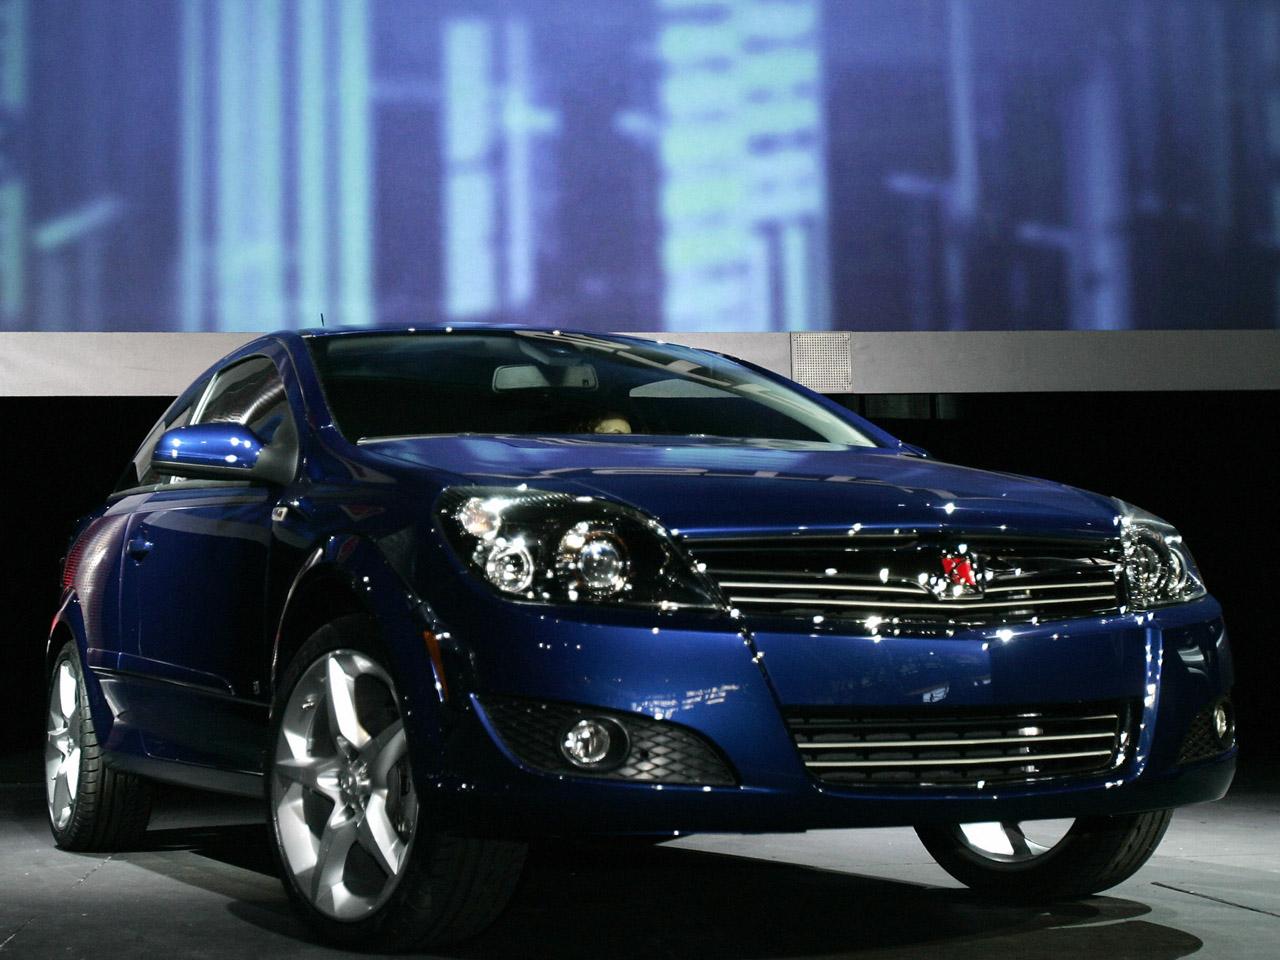 gm recalls 200k cars for takata air bag trouble cbs news. Black Bedroom Furniture Sets. Home Design Ideas